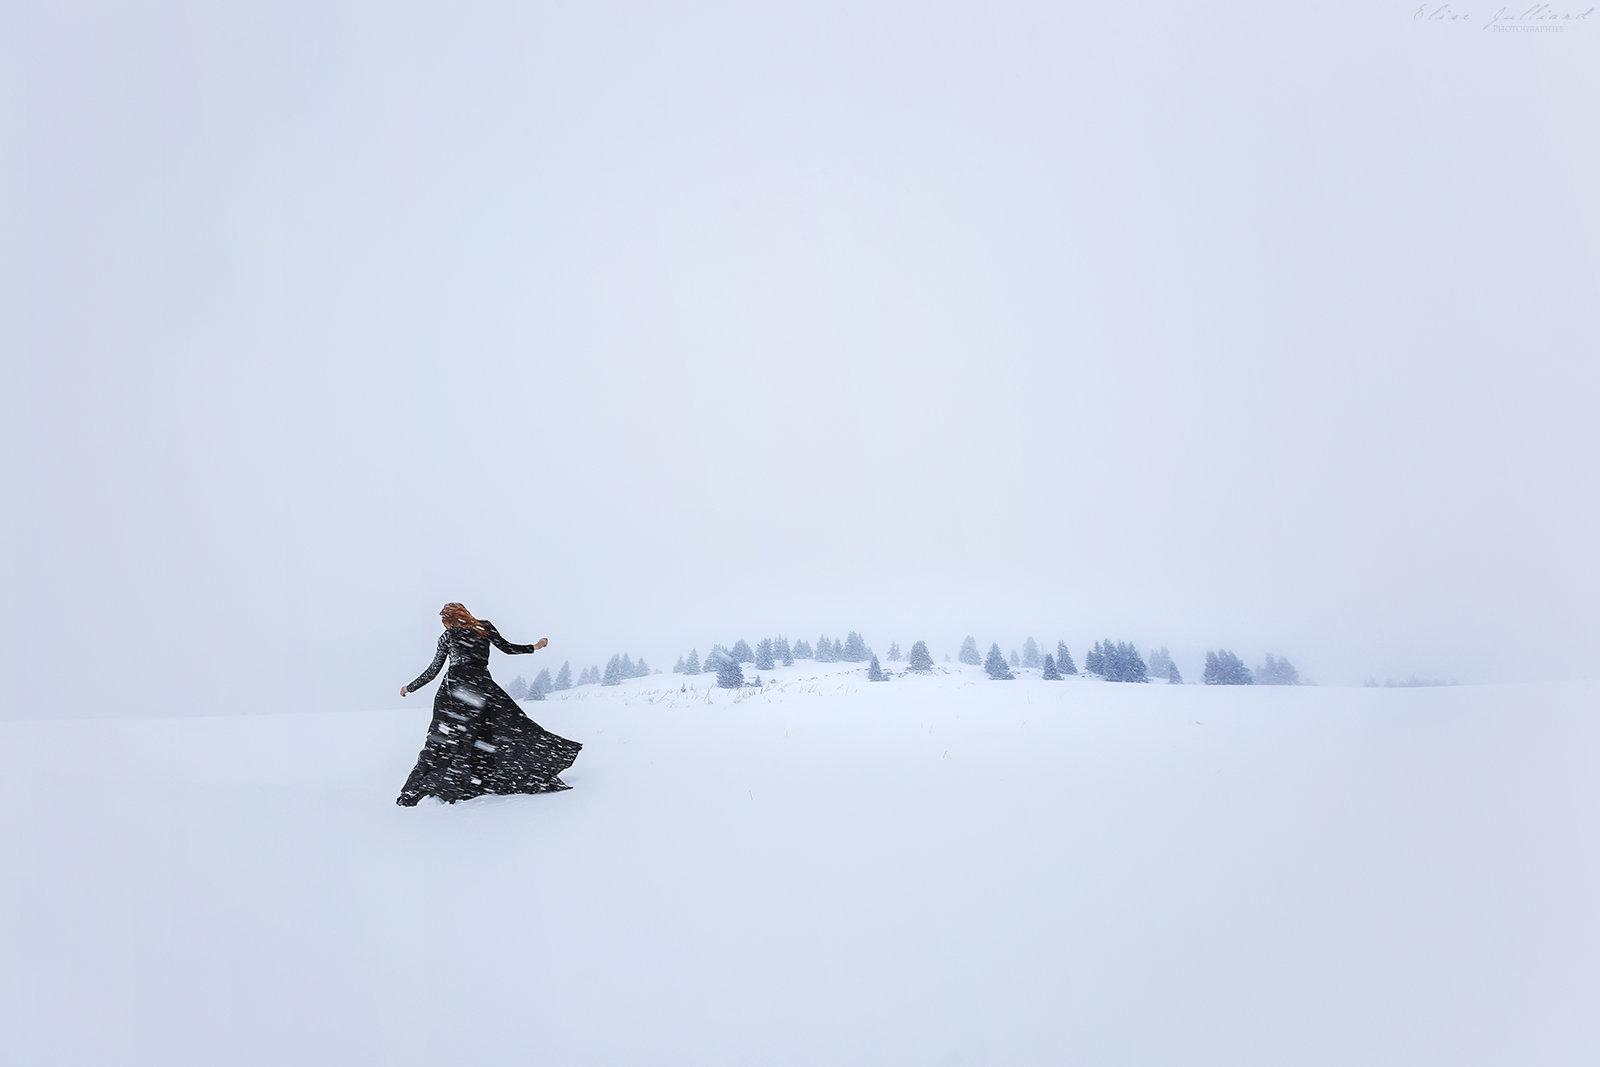 elise-julliard-photographe-portrait-modele-montagne-nature-danse-rousse-haute-savoie-neige